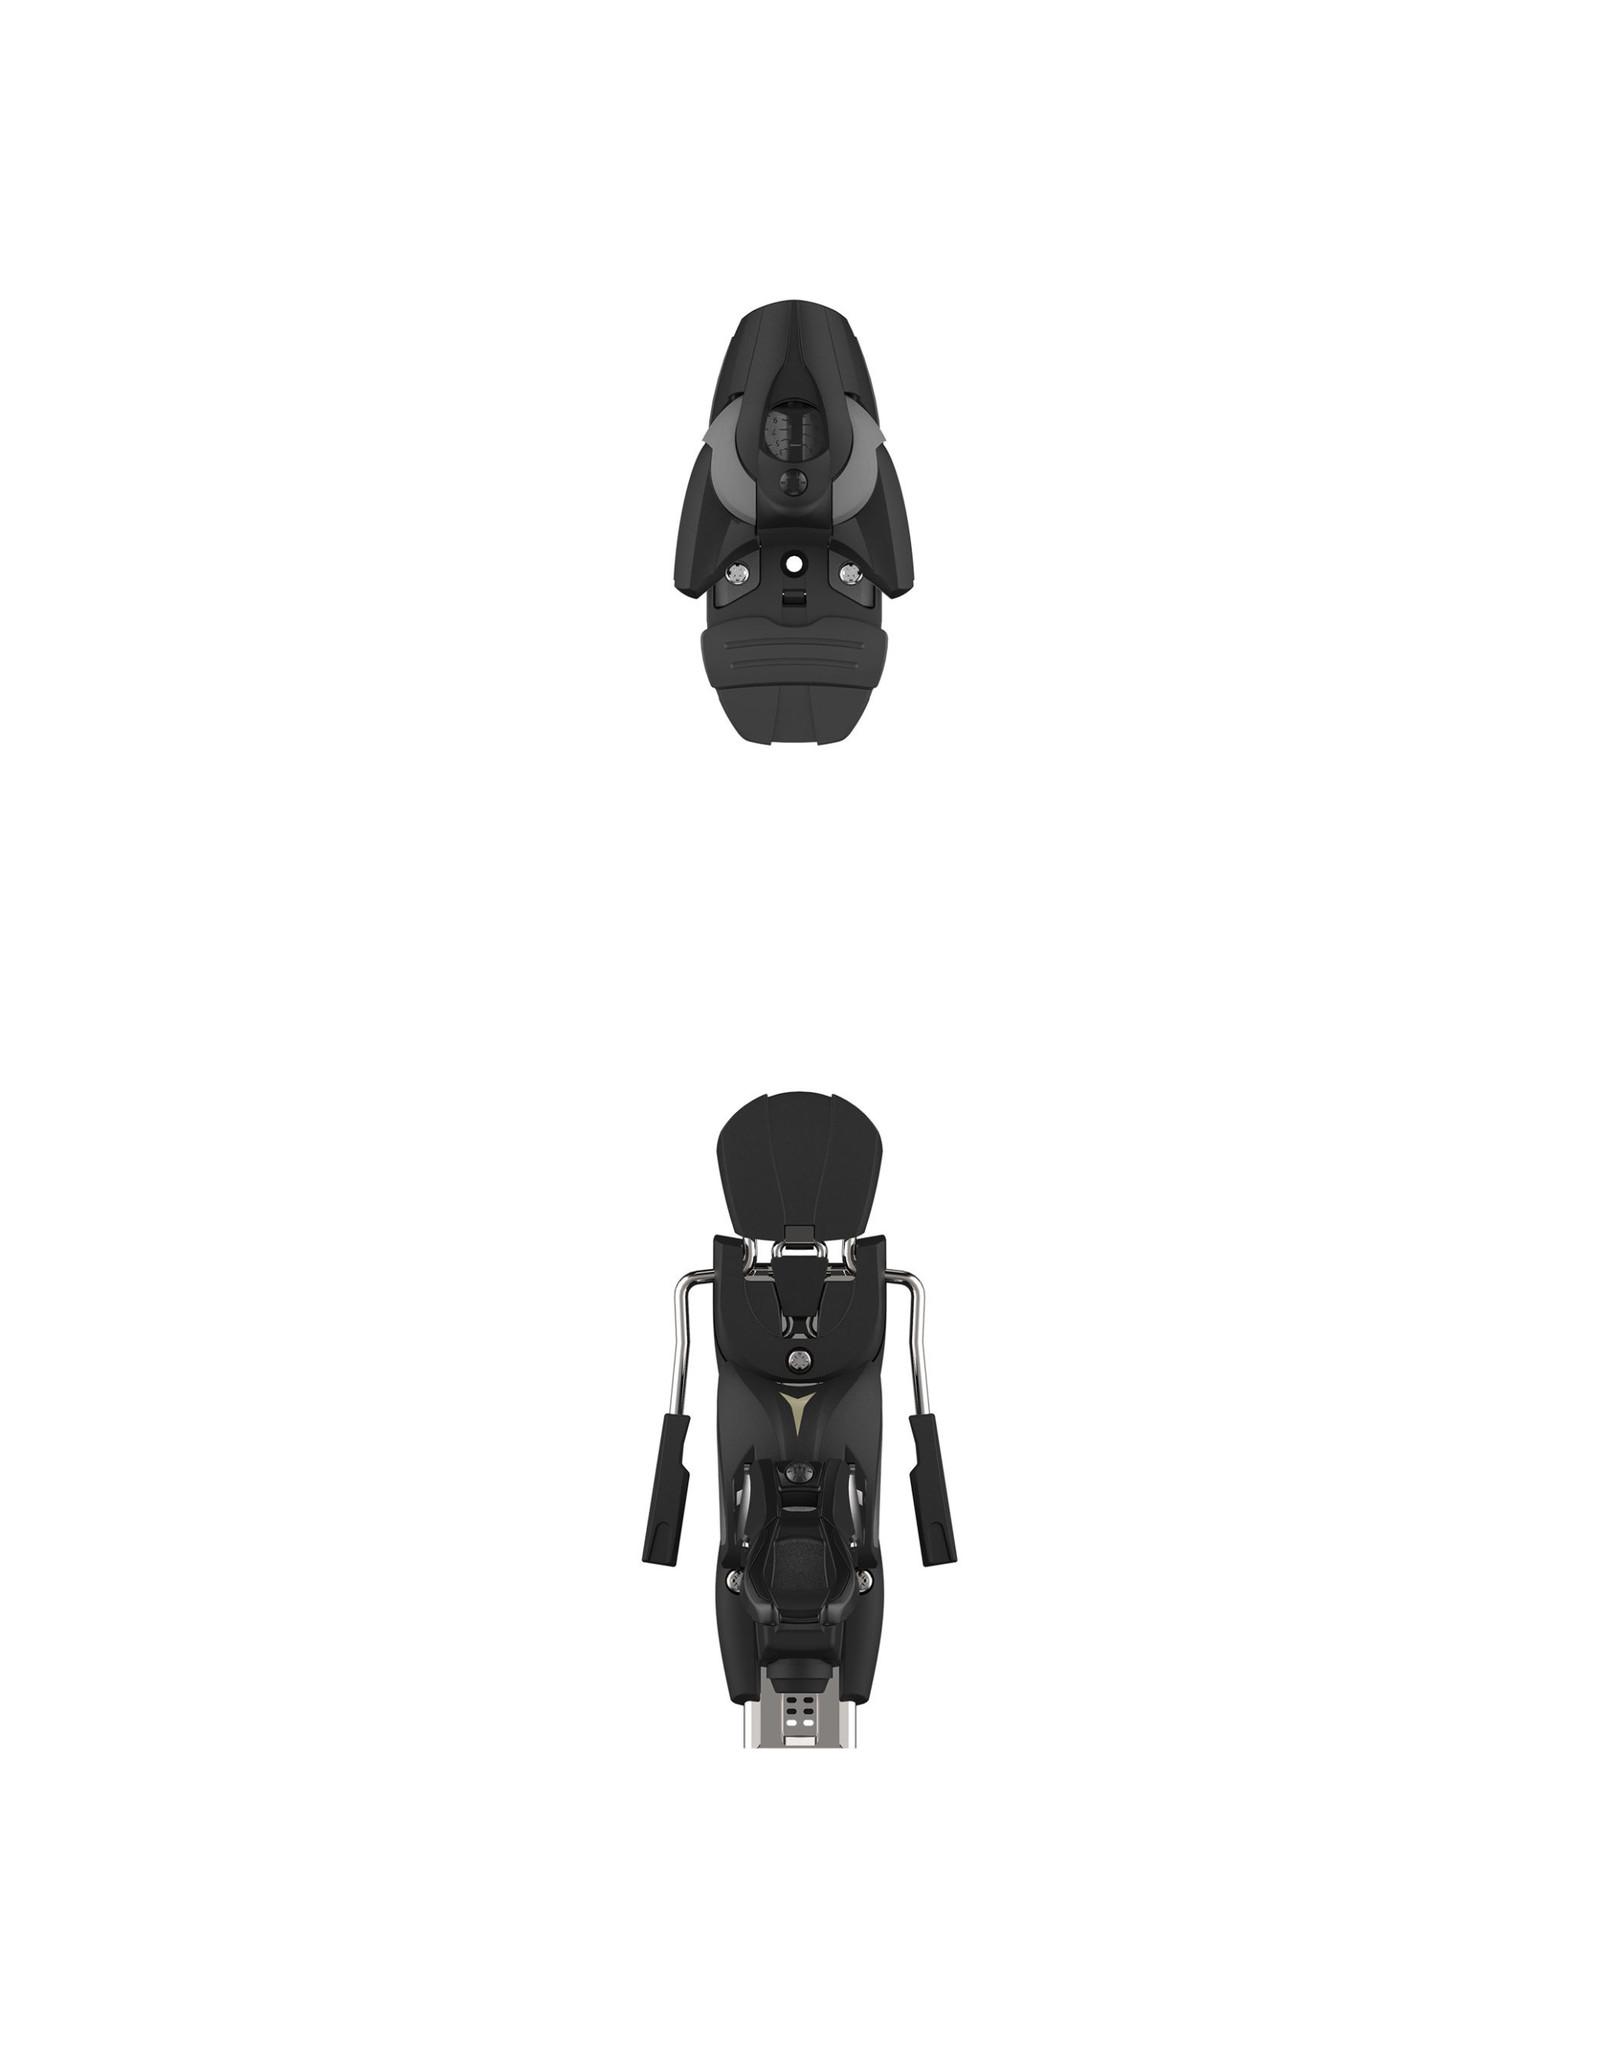 Atomic Atomic Bent Chetler Mini with Colt 10 Bindings - Kids